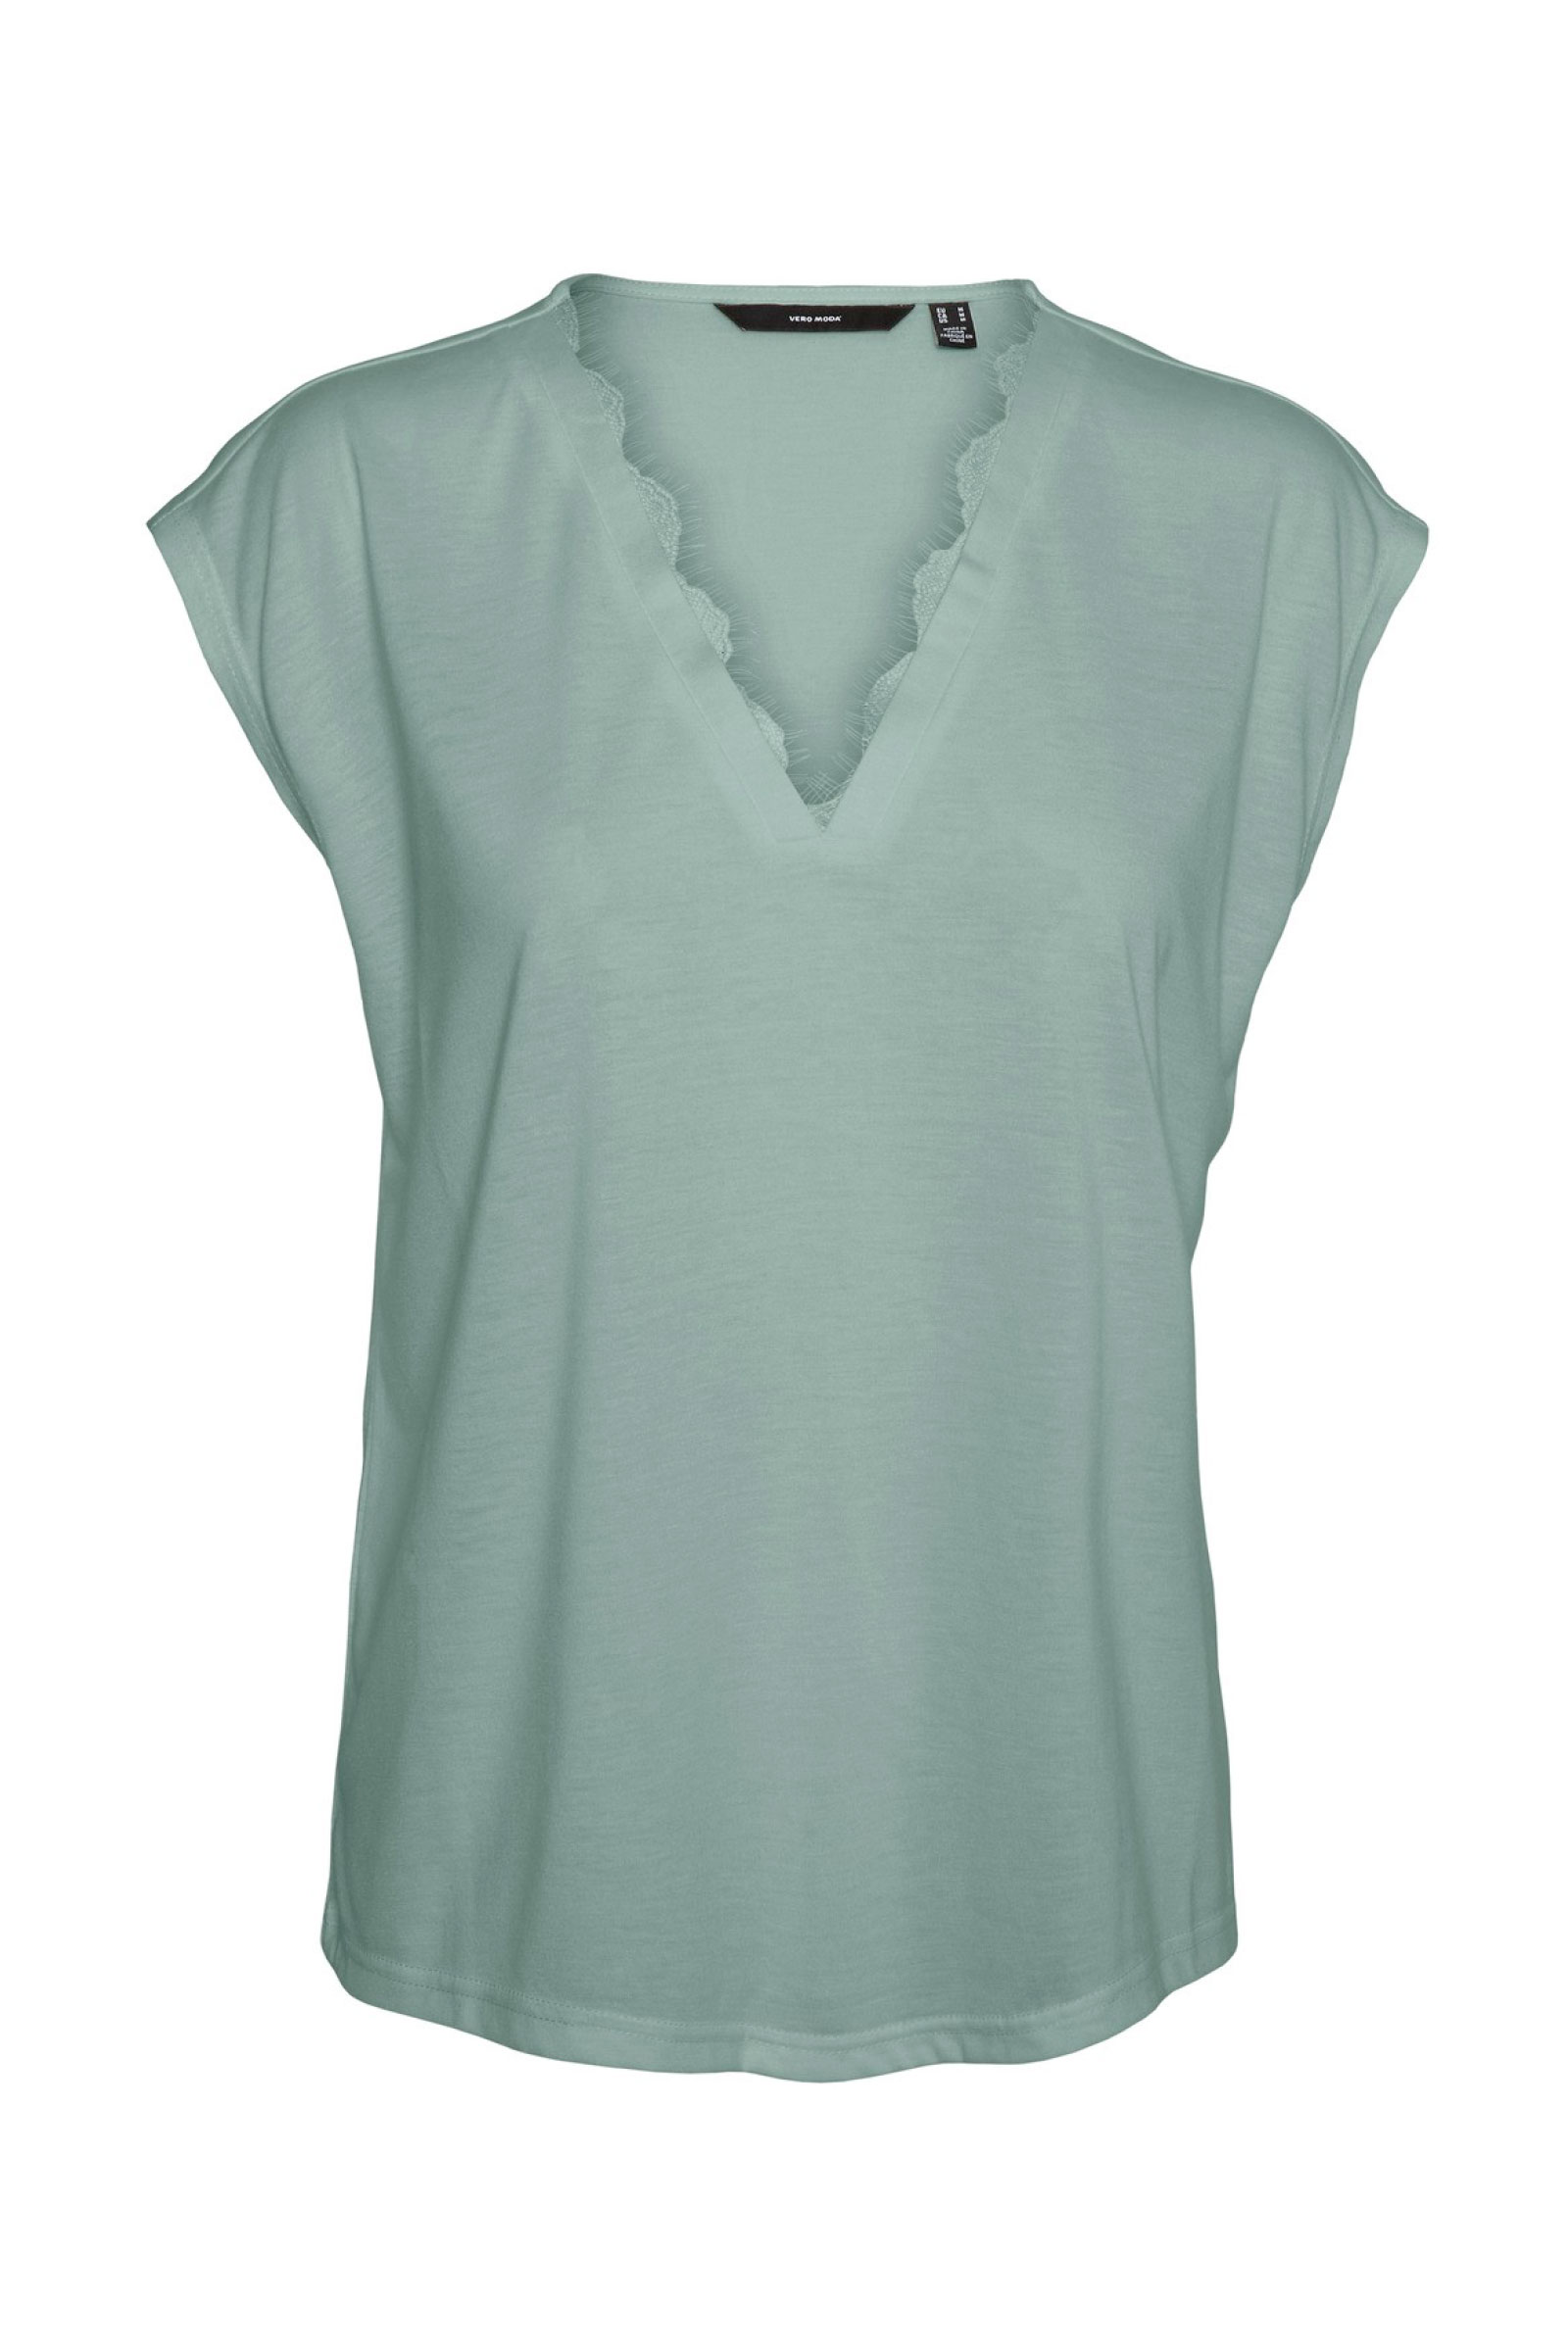 VERO MODA Women's T-Shirt VERO MODA   T-Shirt   10244100Jadeite